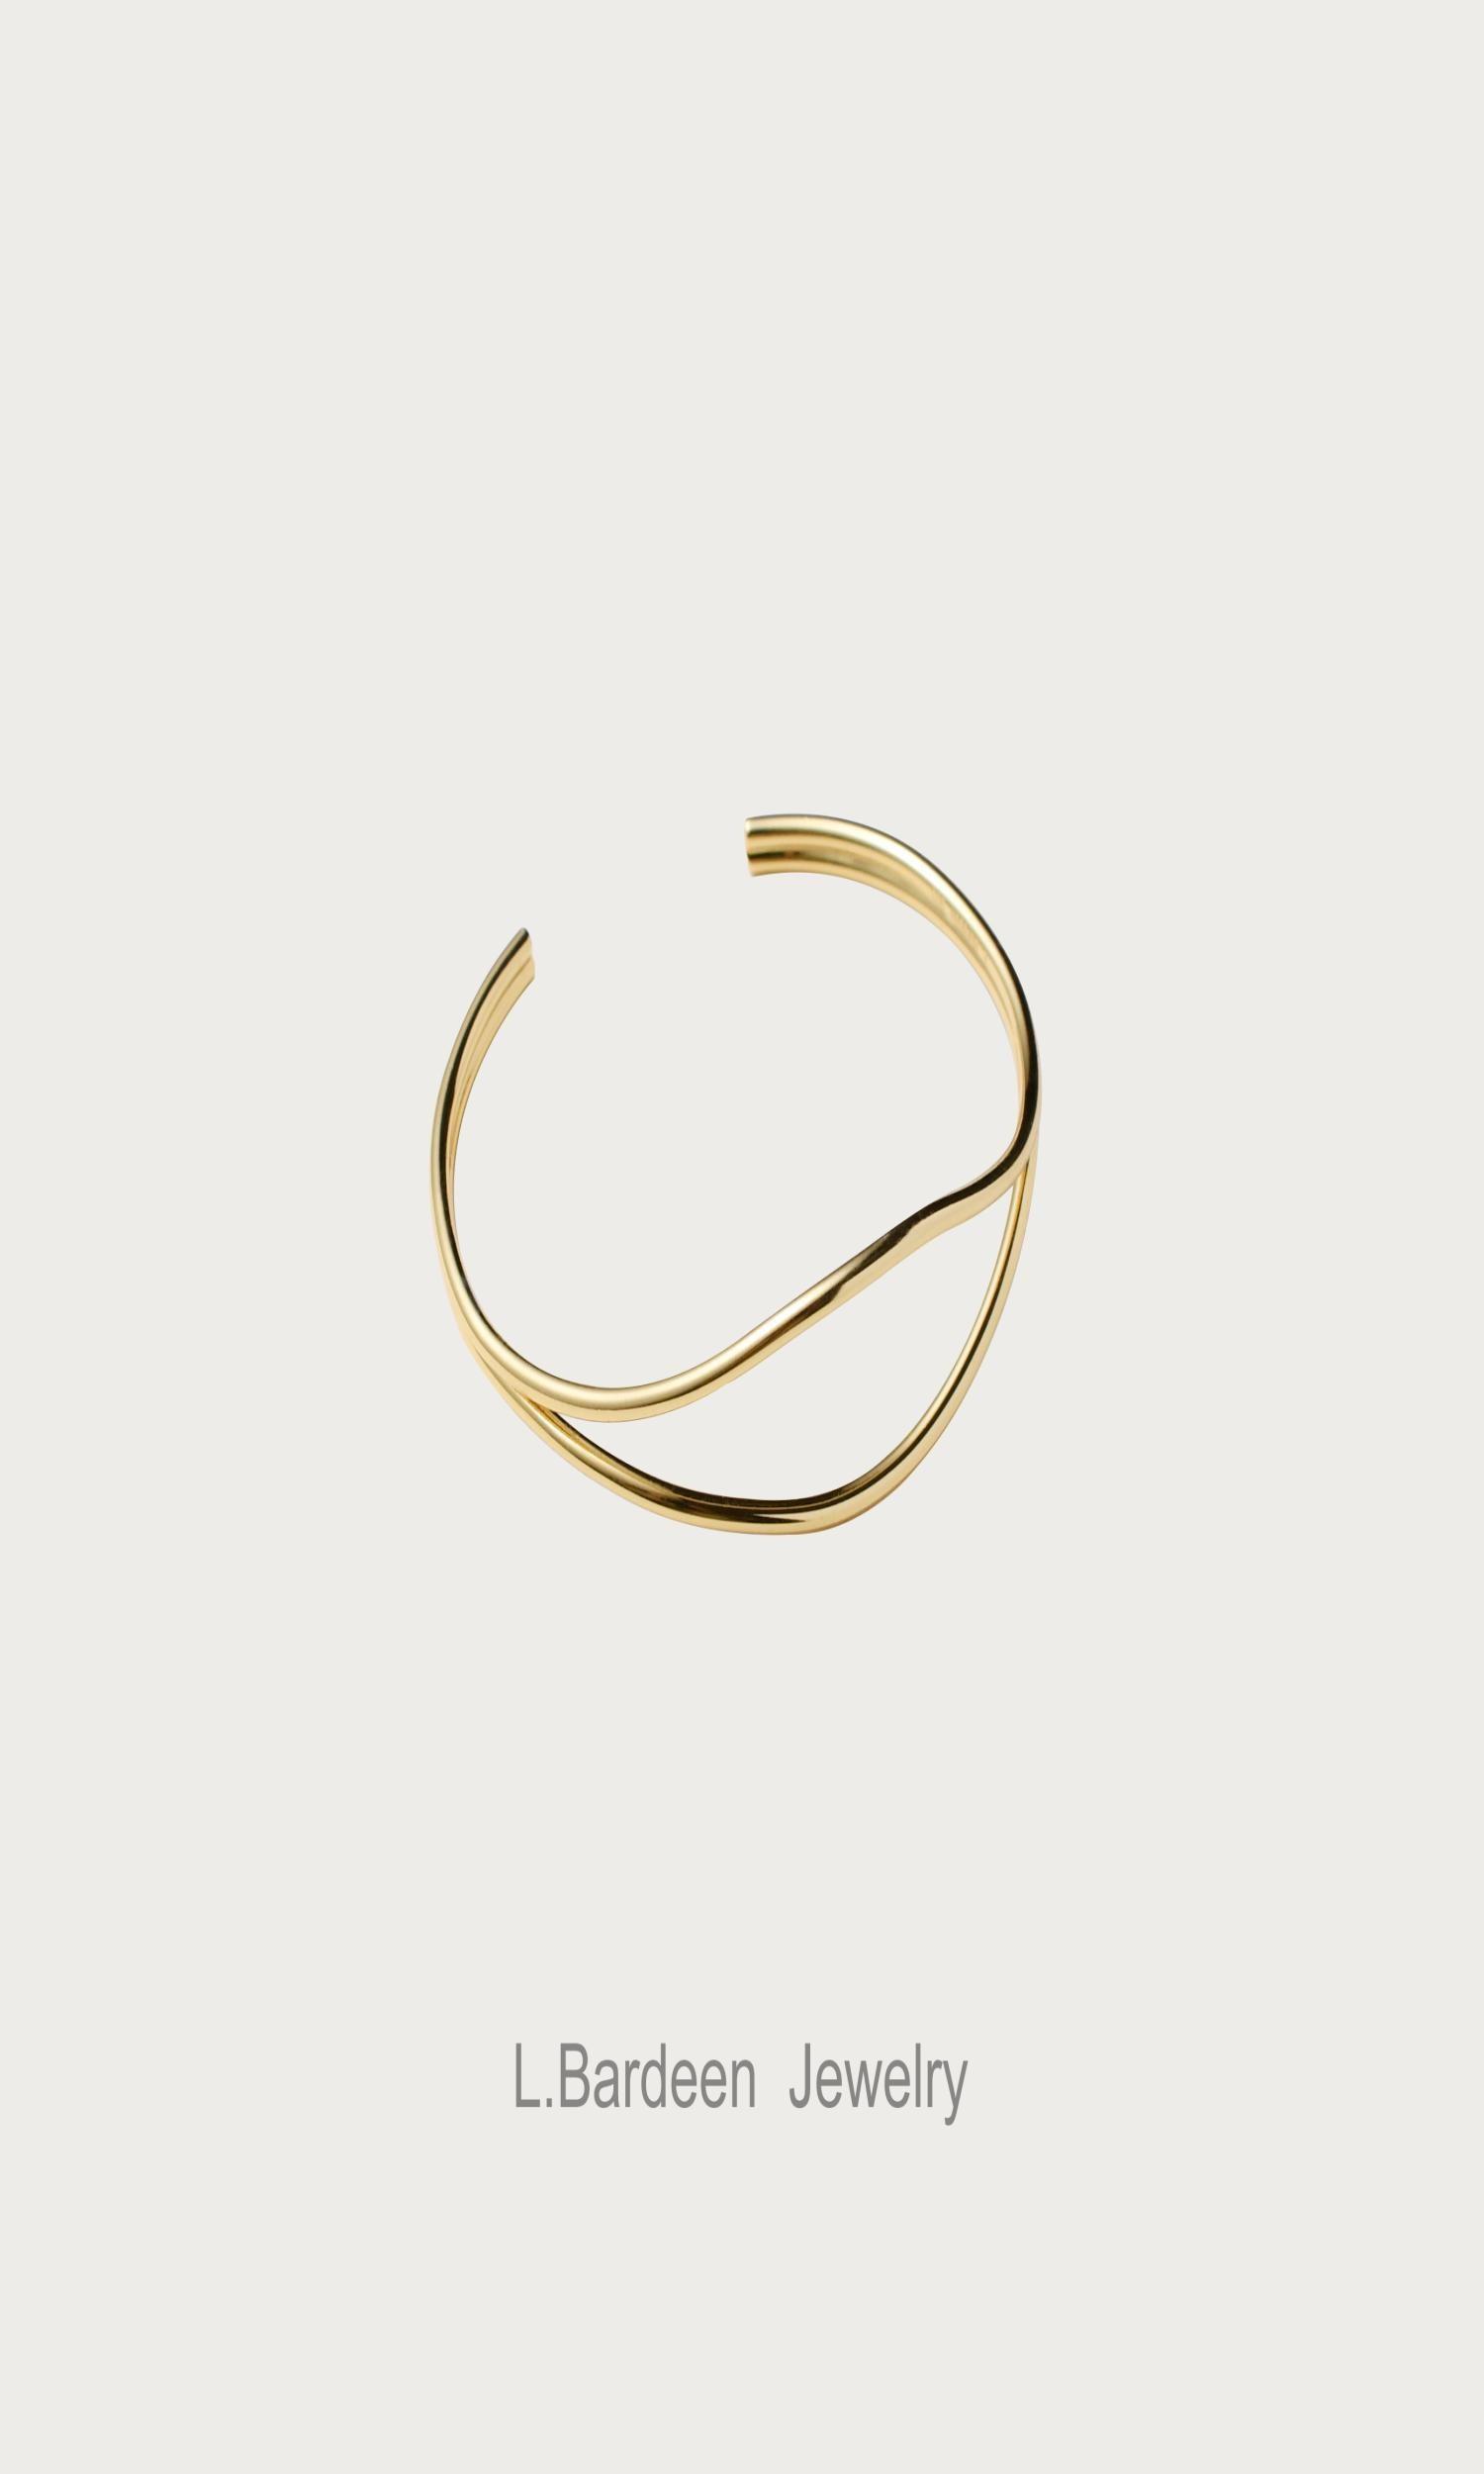 High grade L. Bardeen Sterling Silver Bracelet simple Bracelet Gold temperament retro geometry original niche design